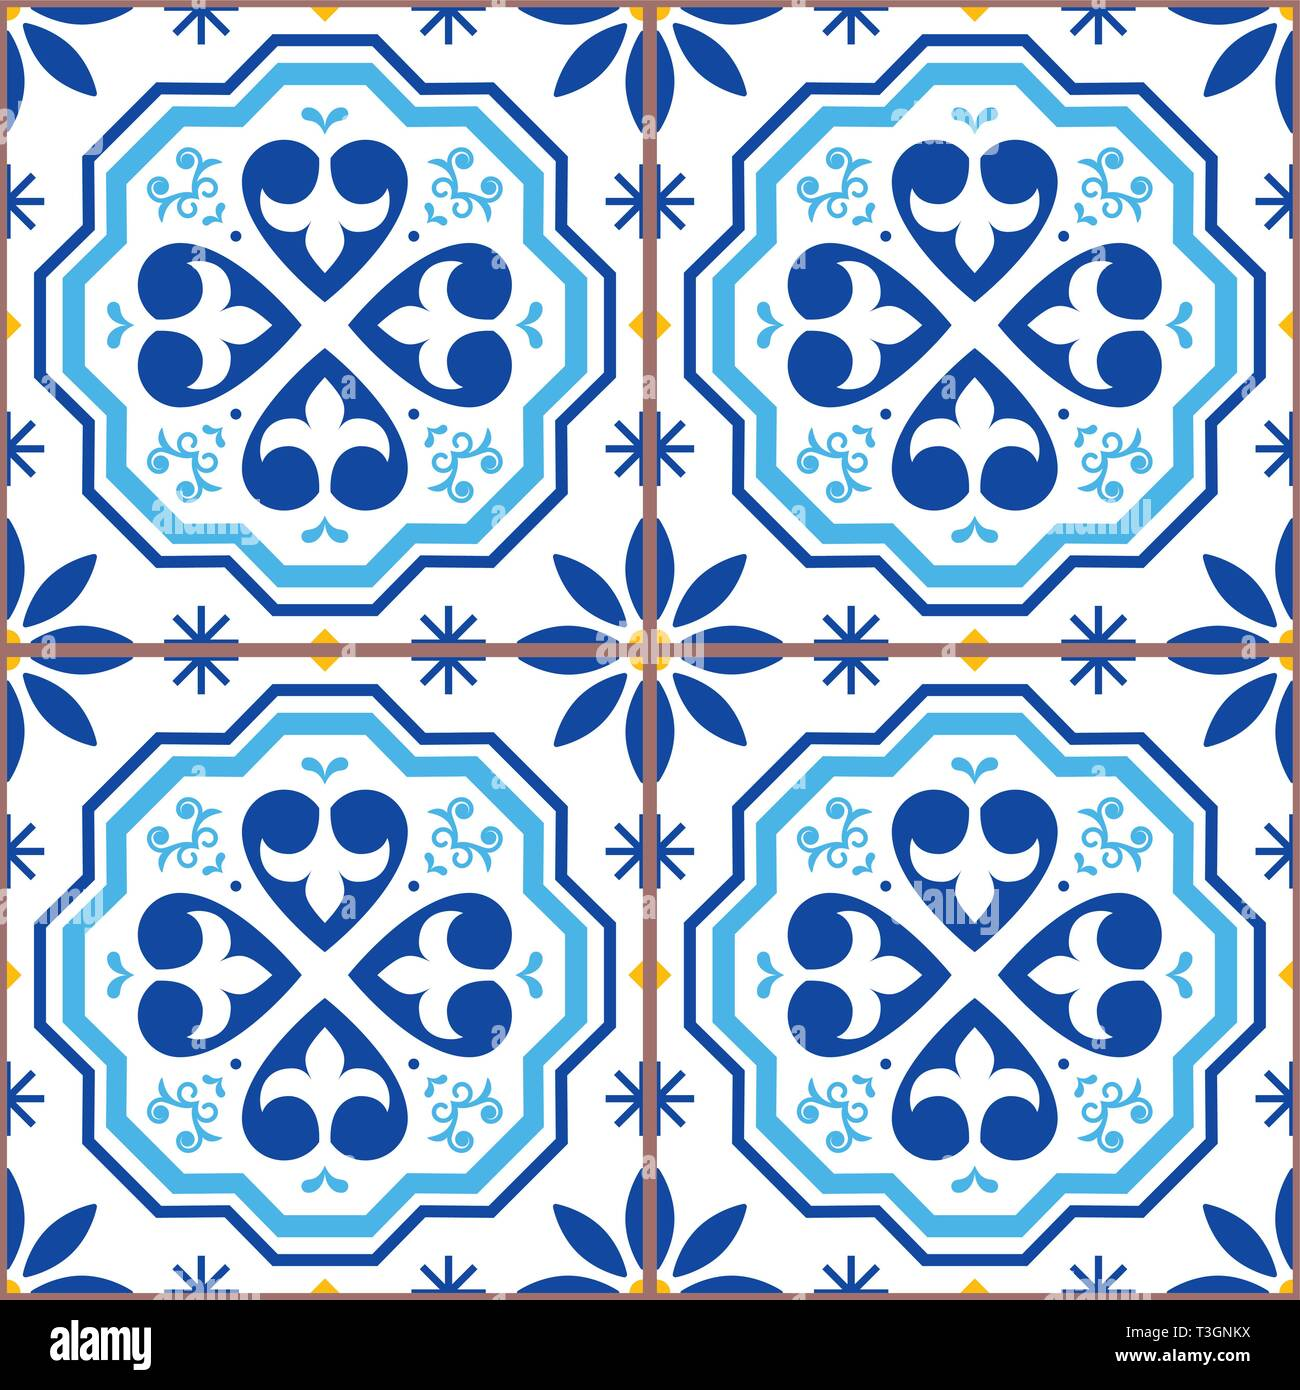 Portuguese tiles Azulejos vector seamless pattern, geometric repetitve design - textile or wallpaper background - Stock Vector